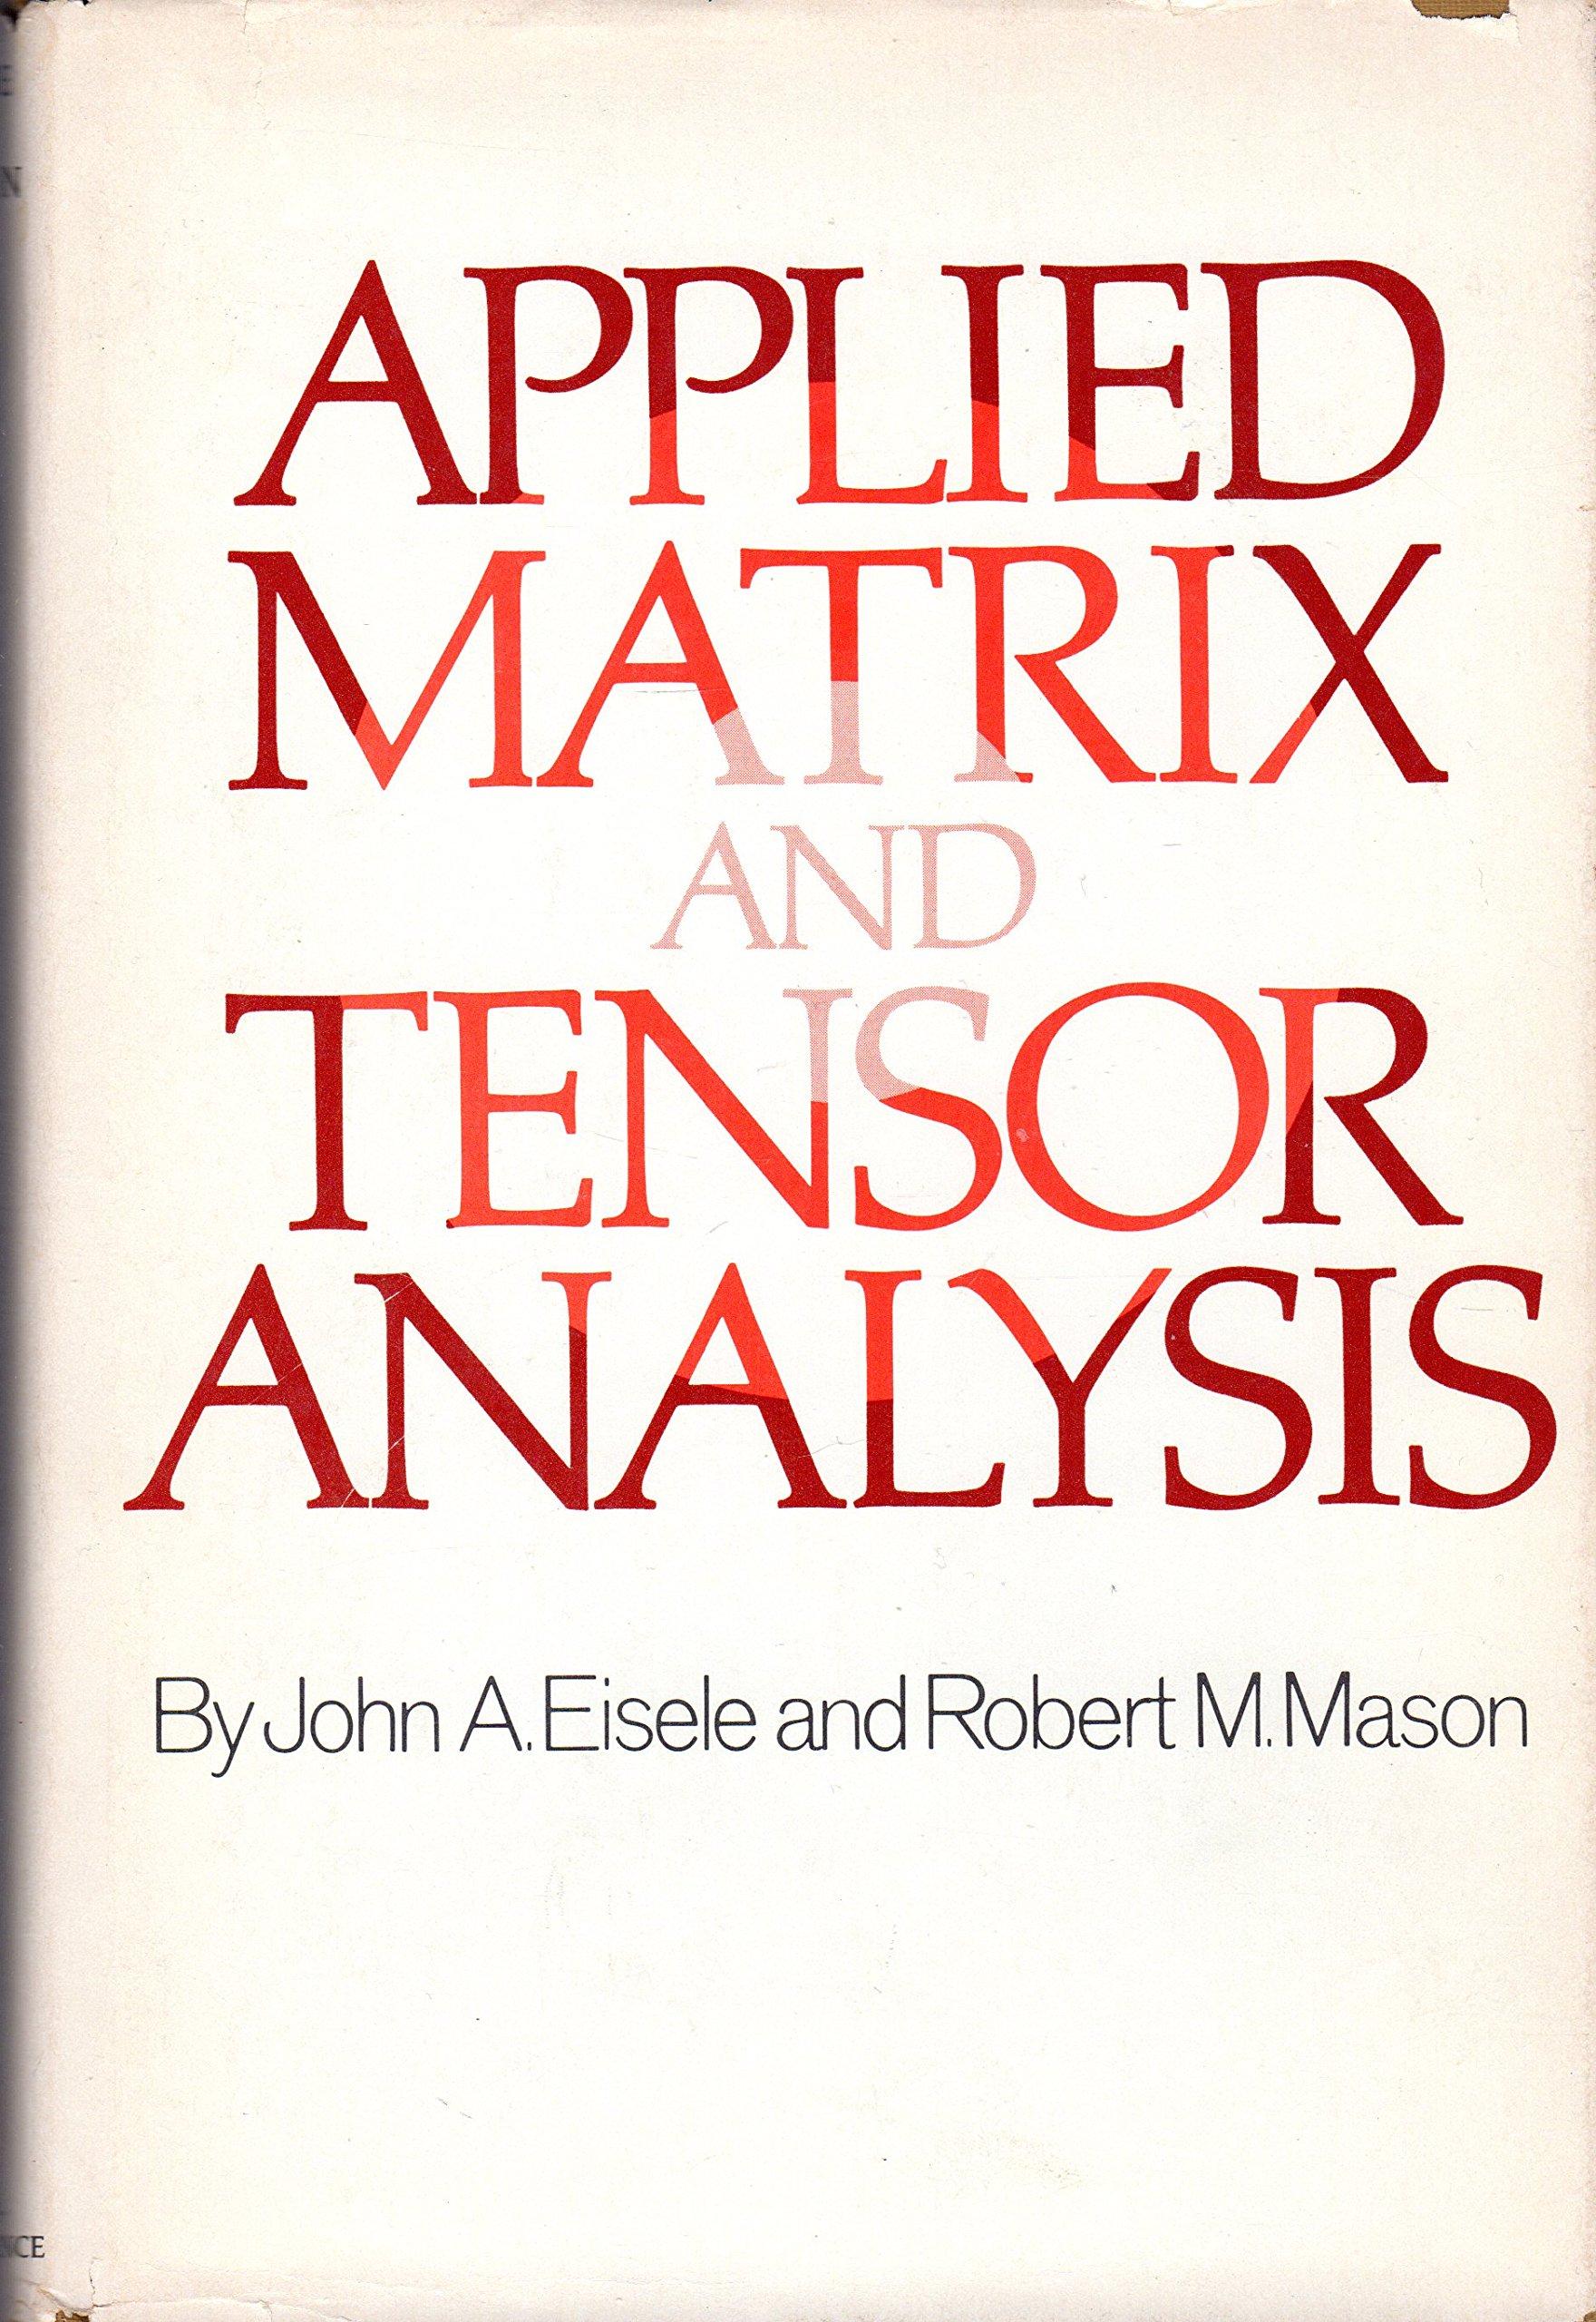 Applied Matrix and Tensor Analysis